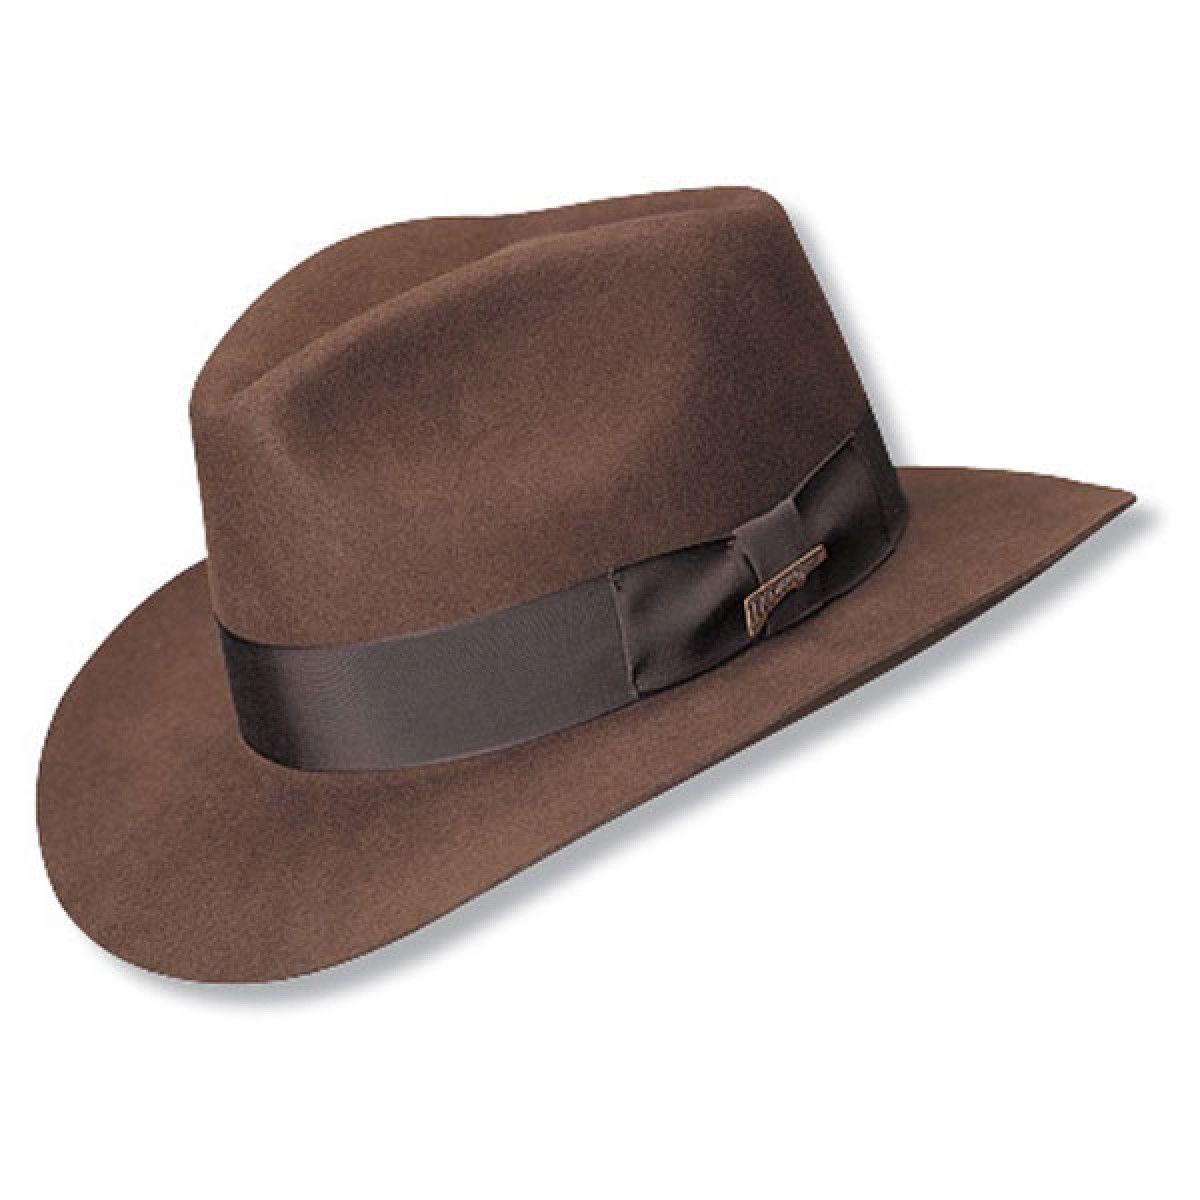 Image result for old man wearing felt hat Sombreros Fedora 44f4deaaa51